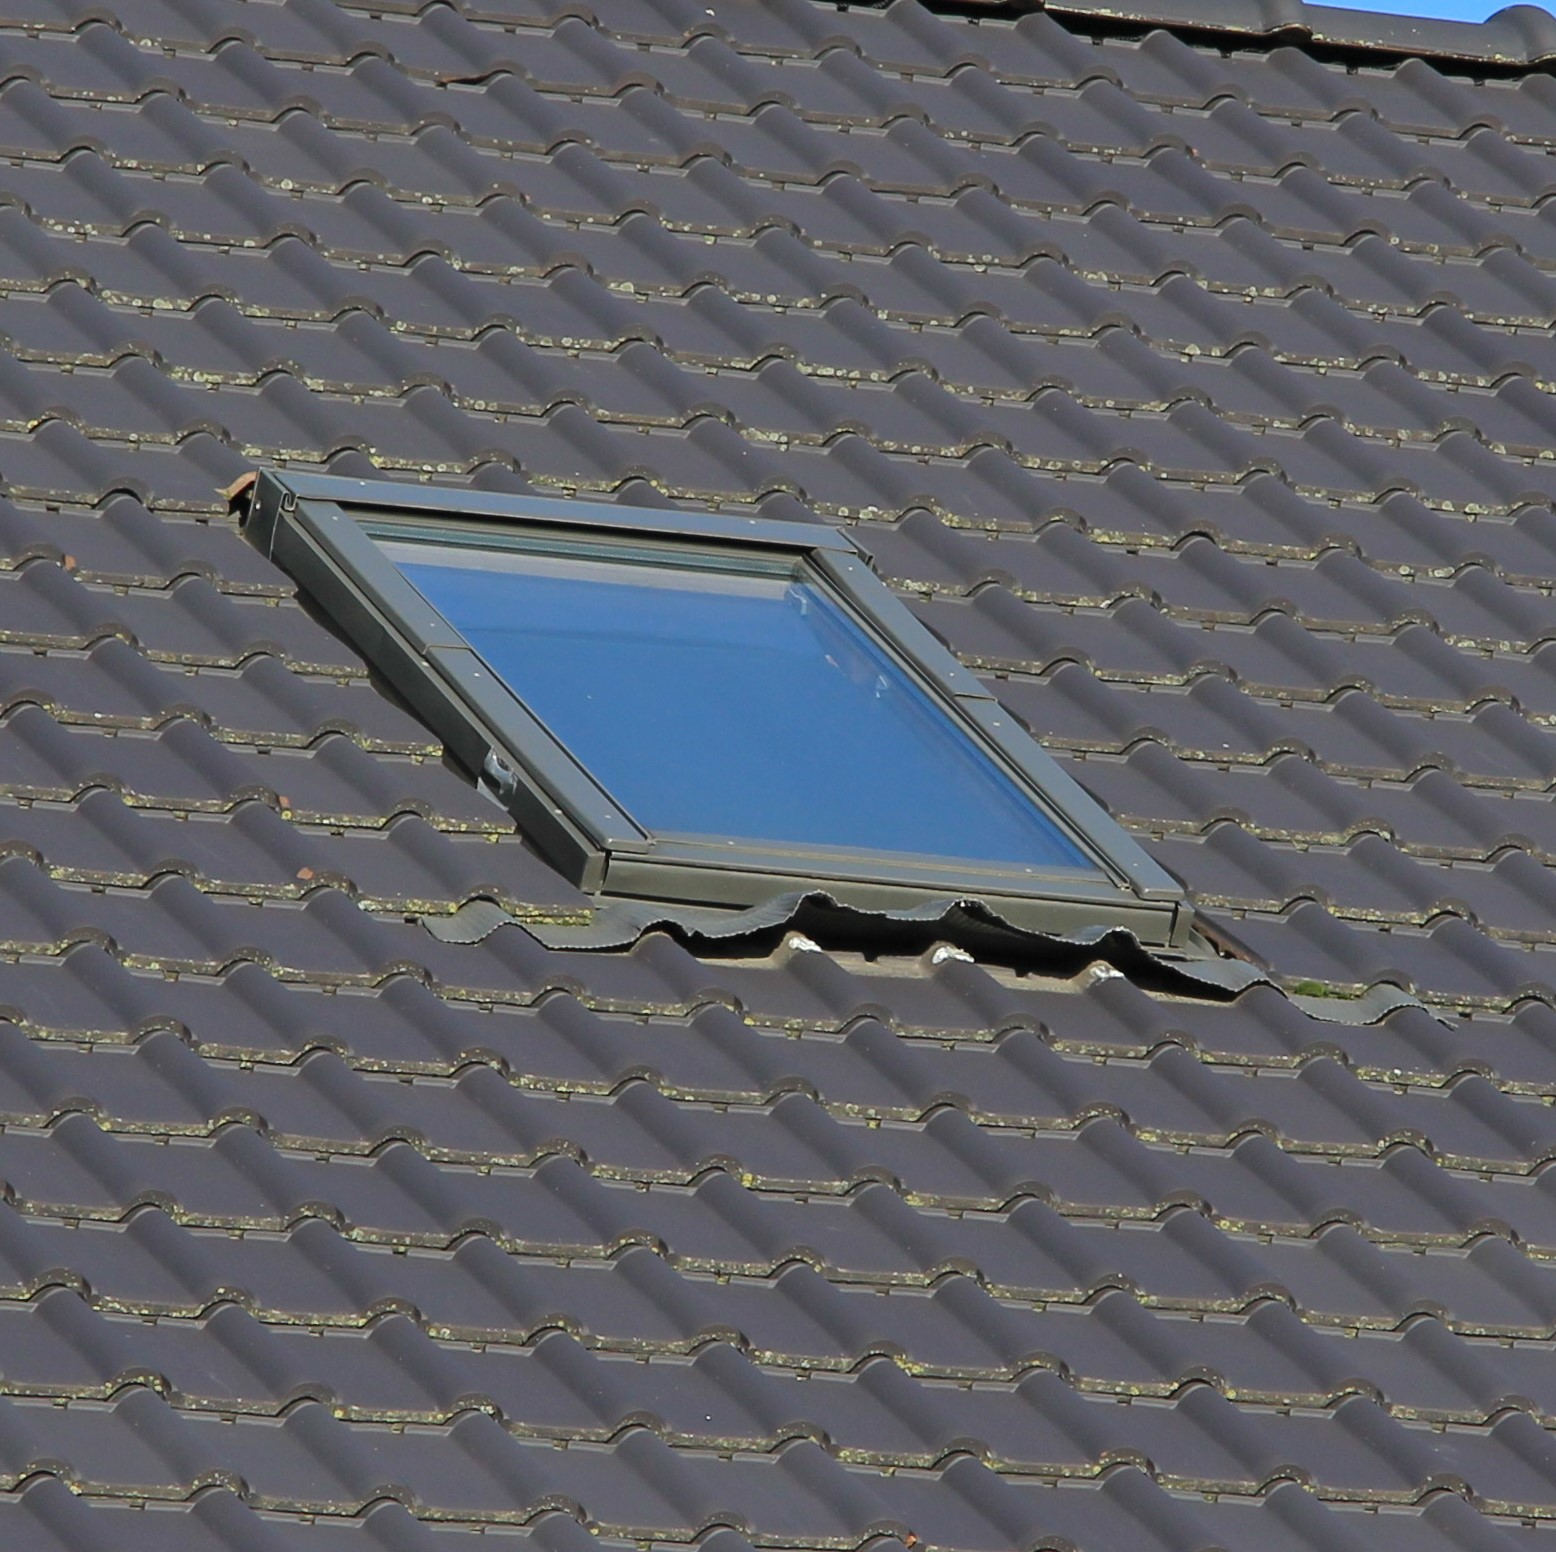 bouwfout strakke ramen